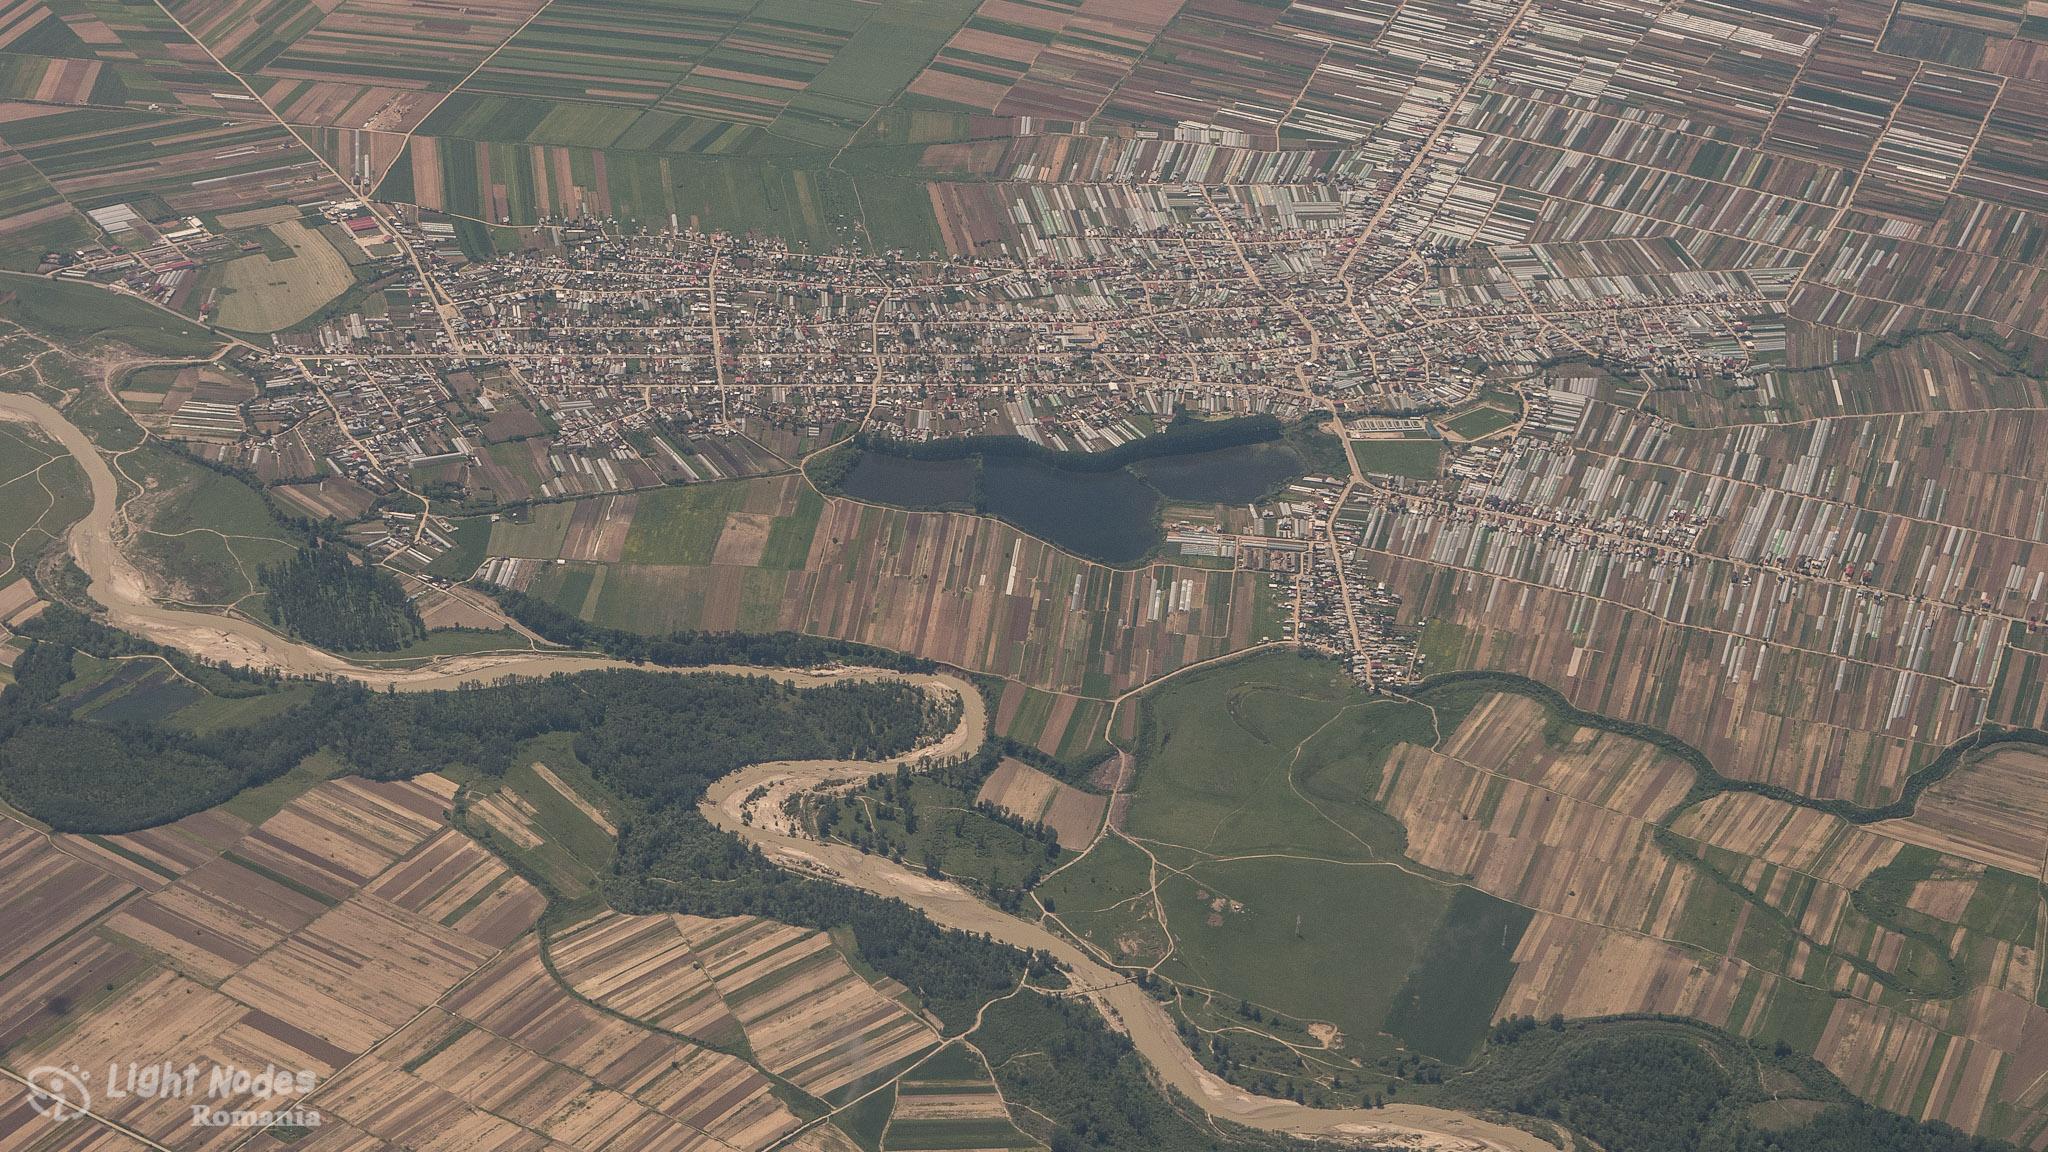 A riverside town in Romania